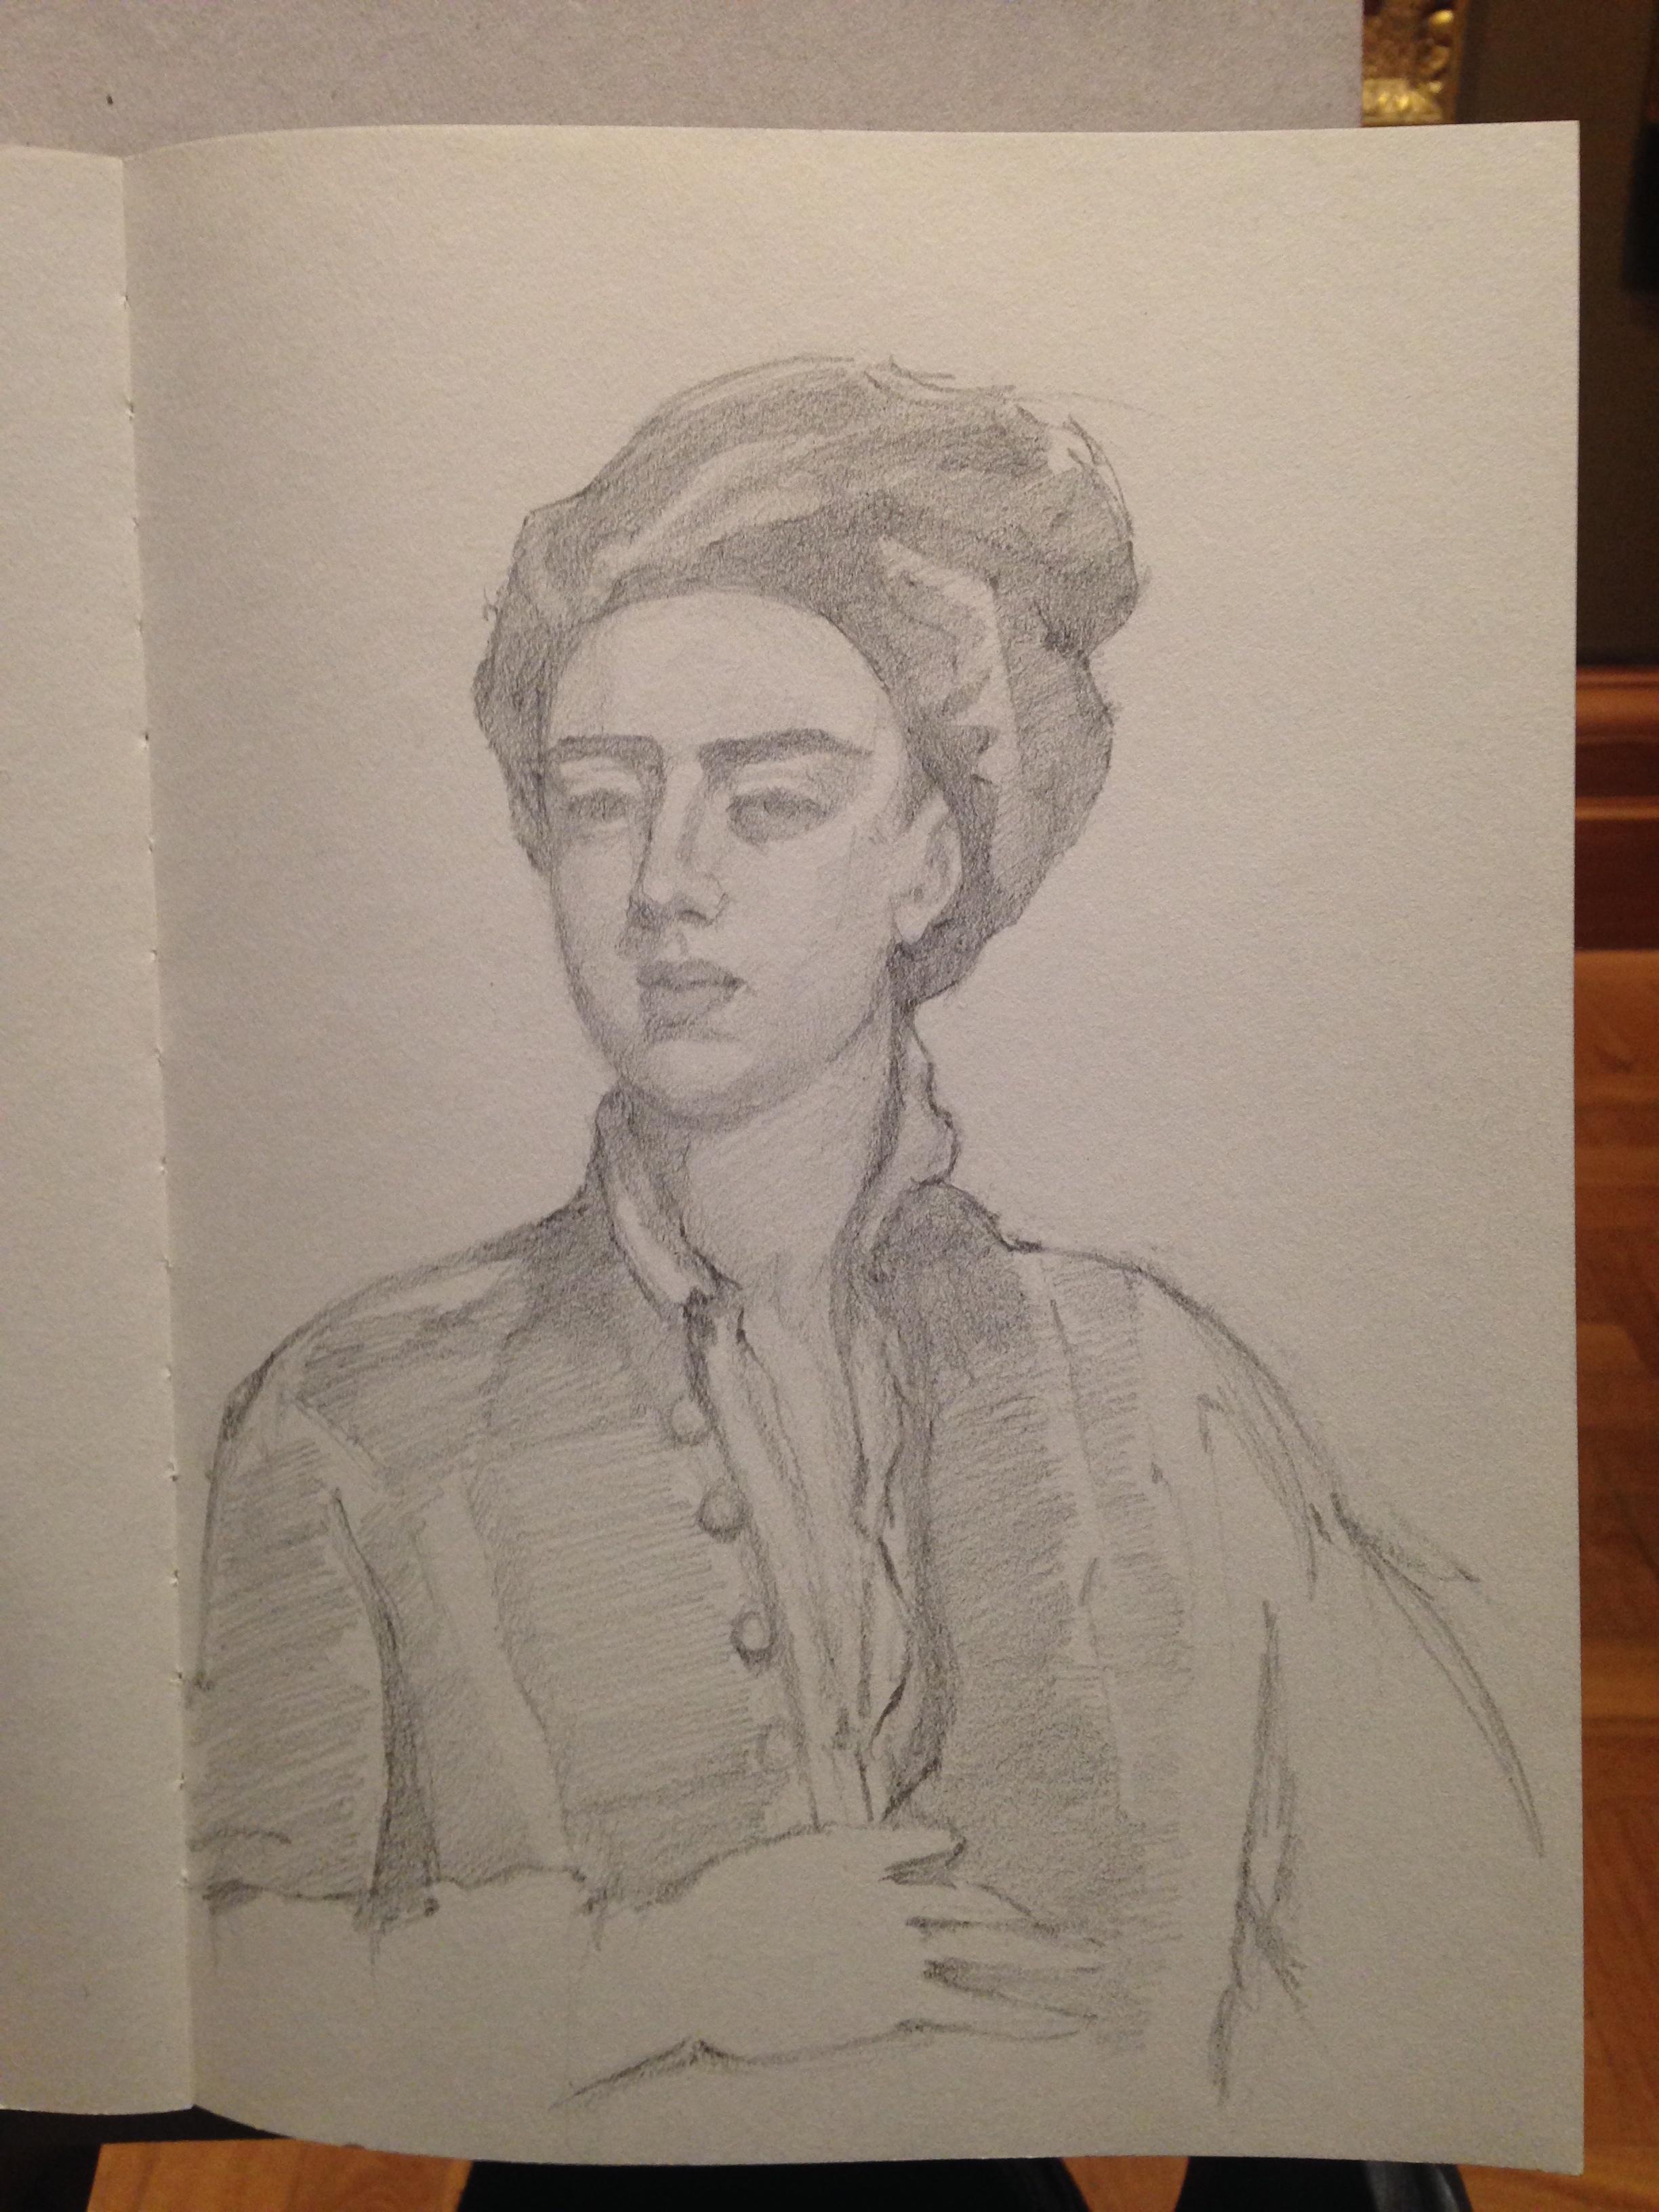 Portrait sketch study